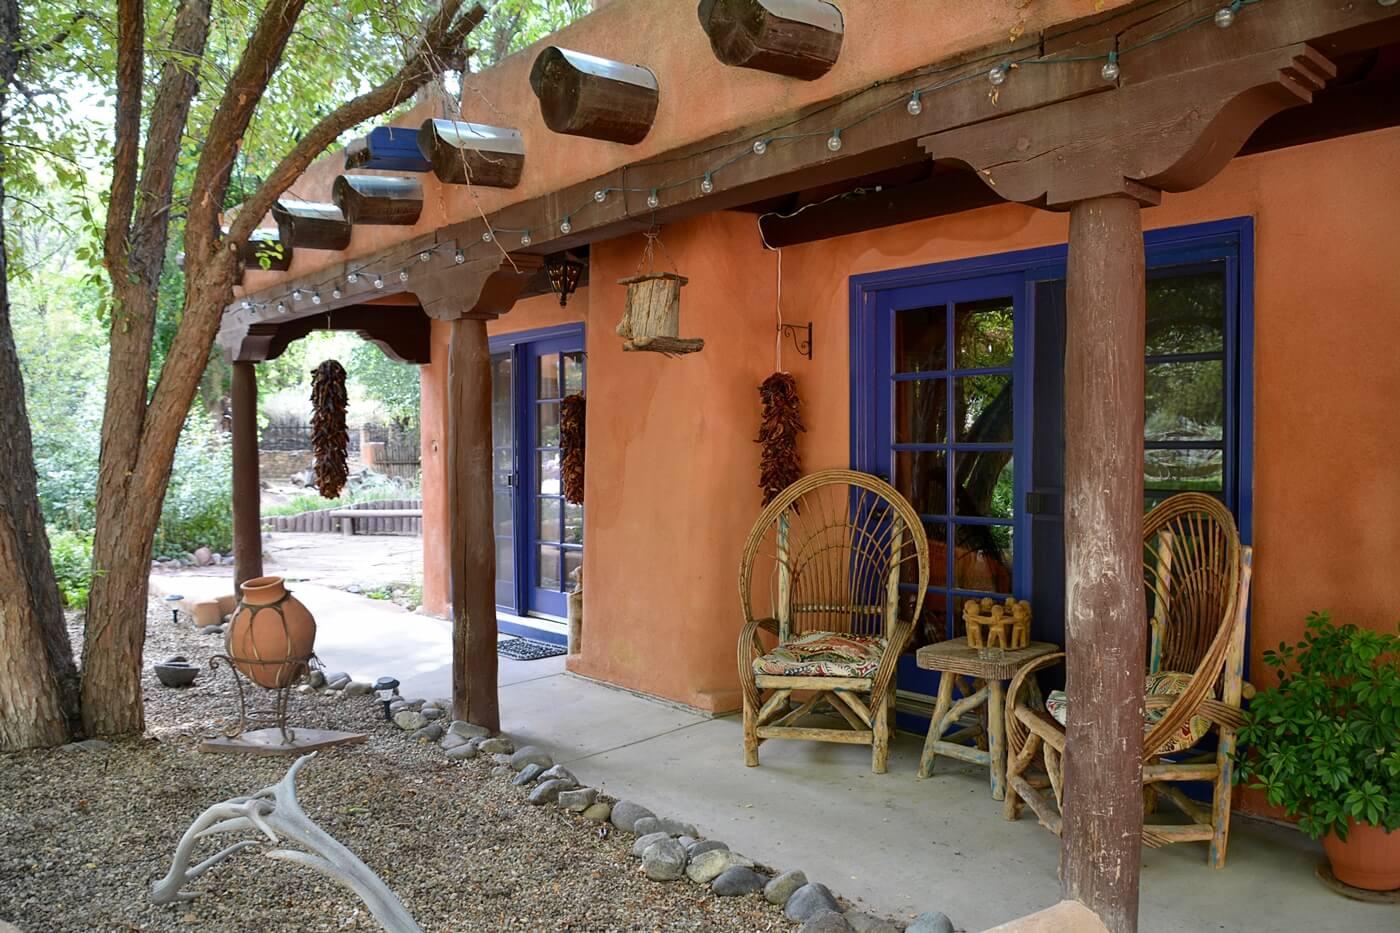 Private porch and entrance